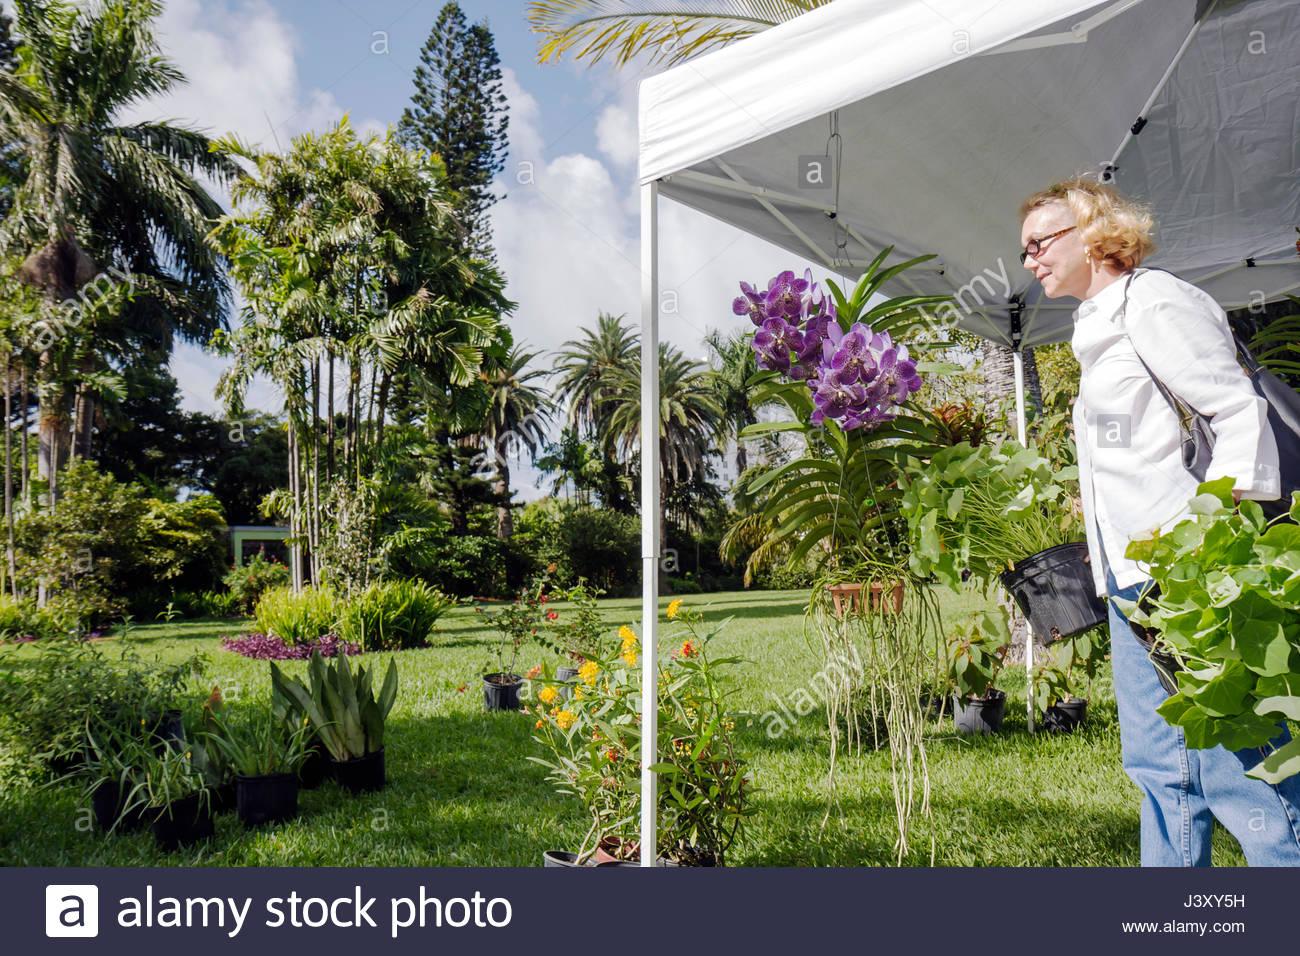 Miami Beach Miami Florida Beach Botanical Garden Tour Of Miami Beach Gardens  Horticulture Gardening Woman Orchid Plants Flower T